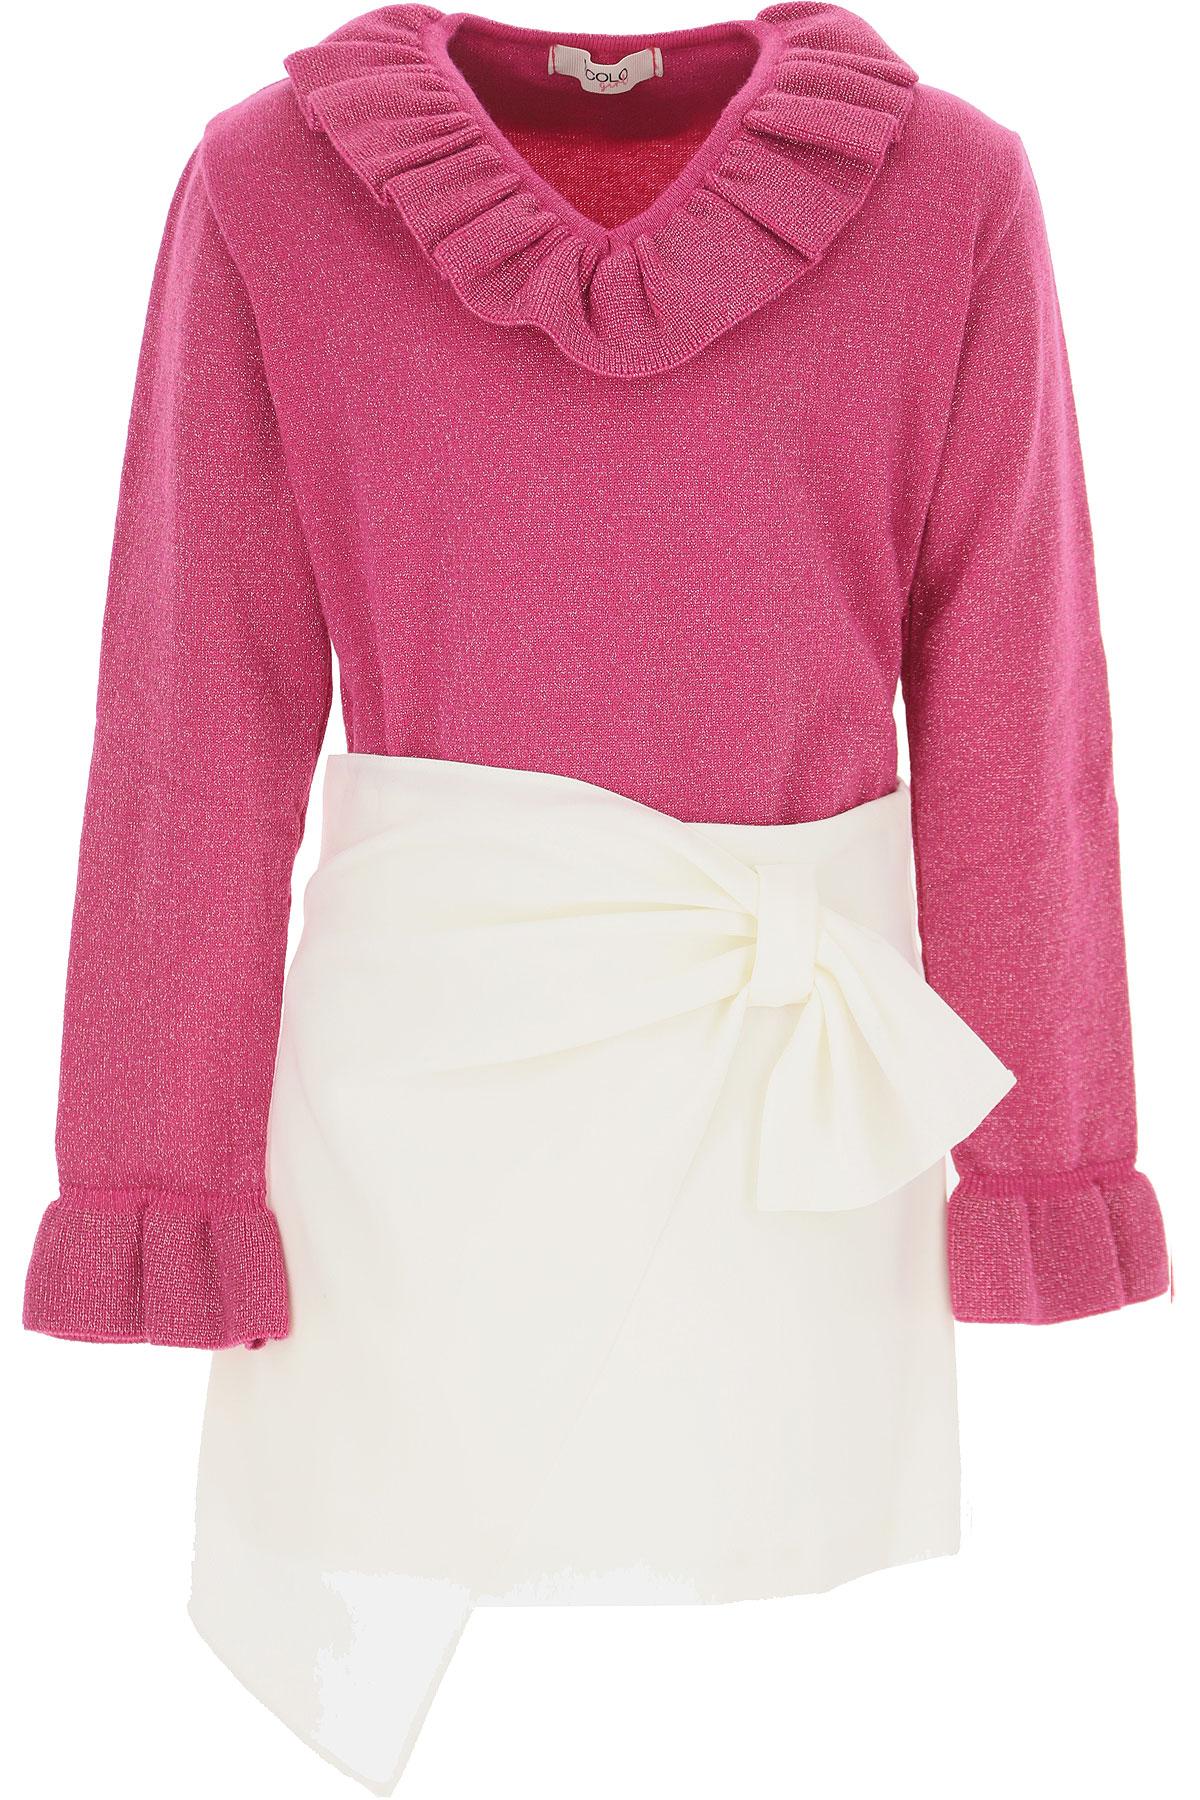 Vicolo Kids Sweaters for Girls On Sale, Fuchsia Lurex, Viscose, 2019, 4Y 6Y 8Y